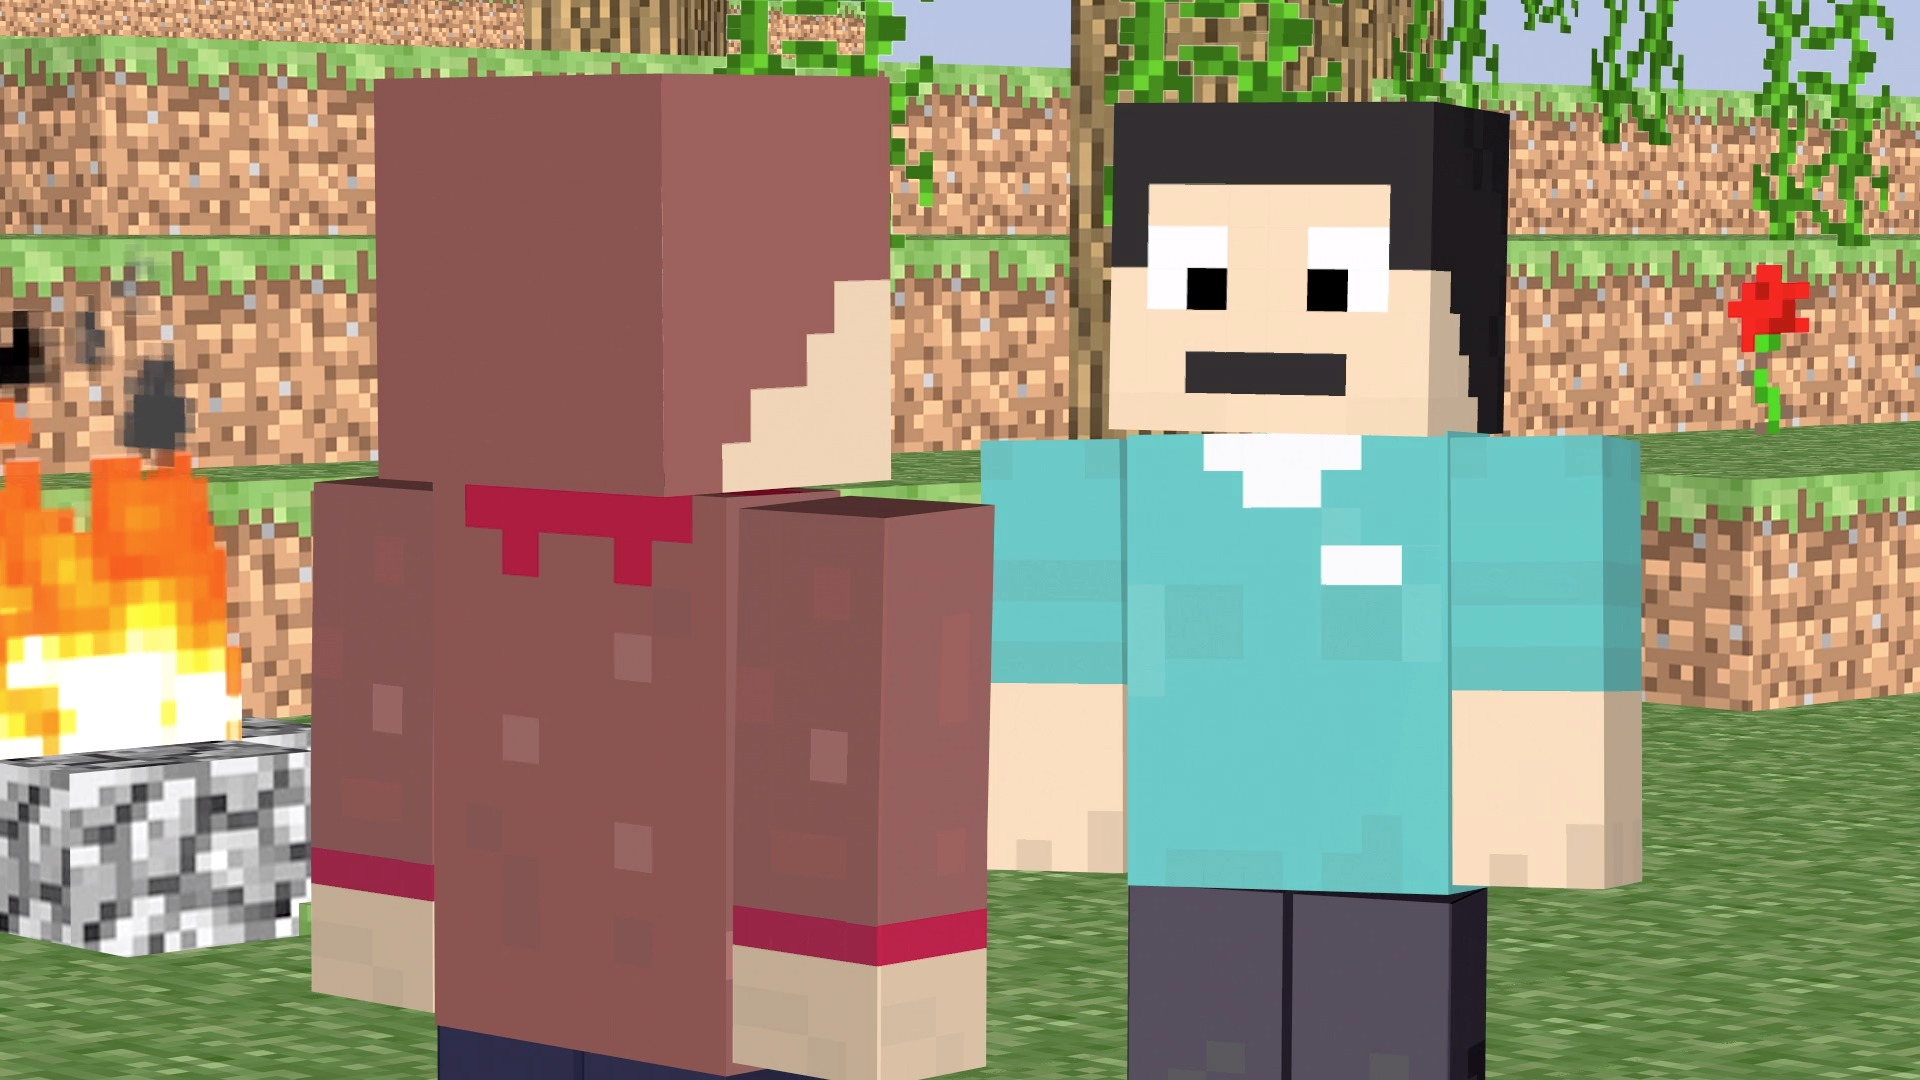 Minecraft South Park